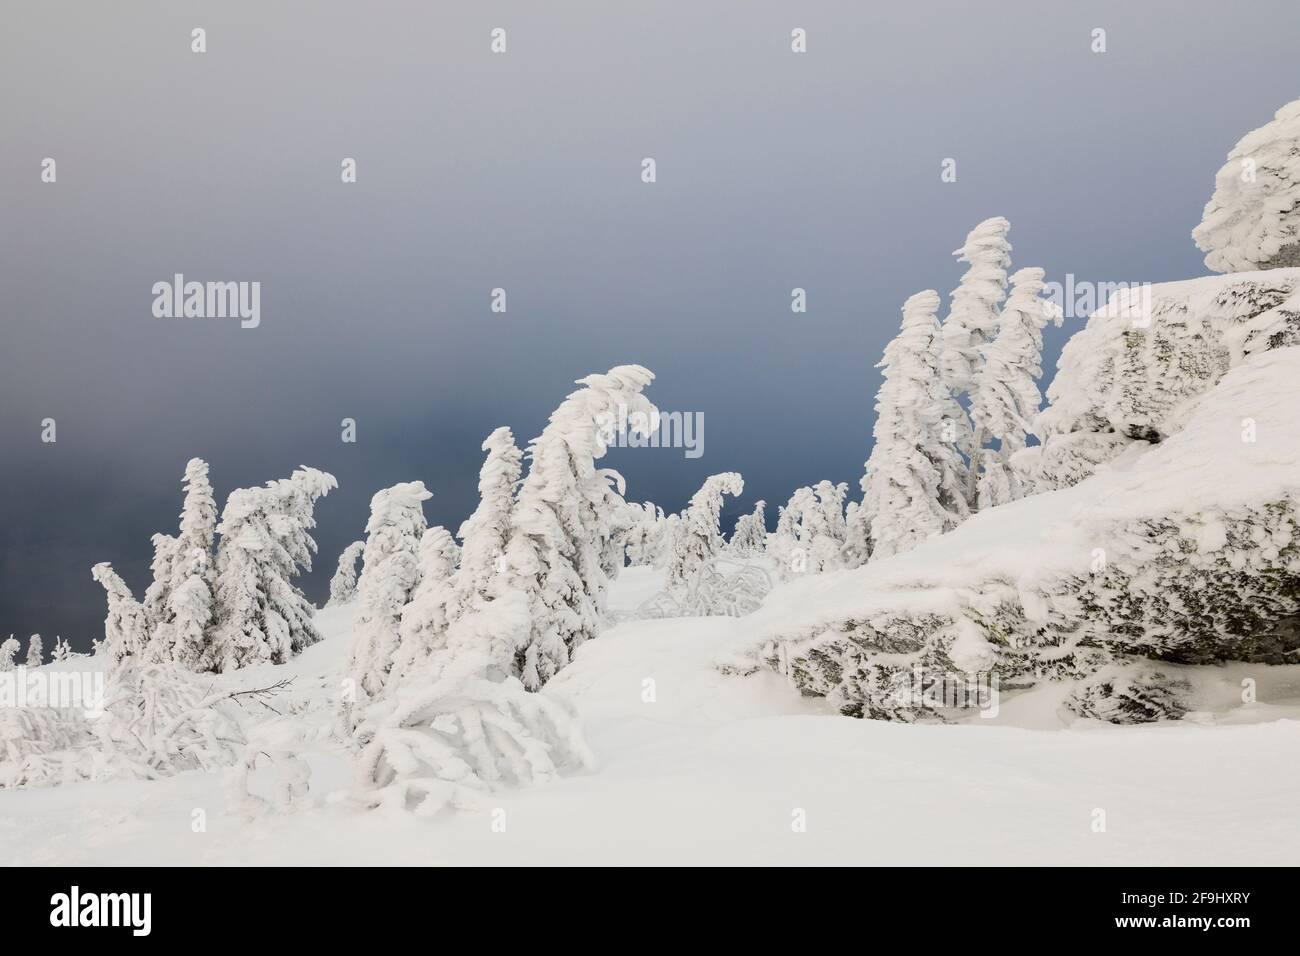 Paysage en hiver. Grand Arber, Forêt de Bohême, Bavière, Allemagne Banque D'Images